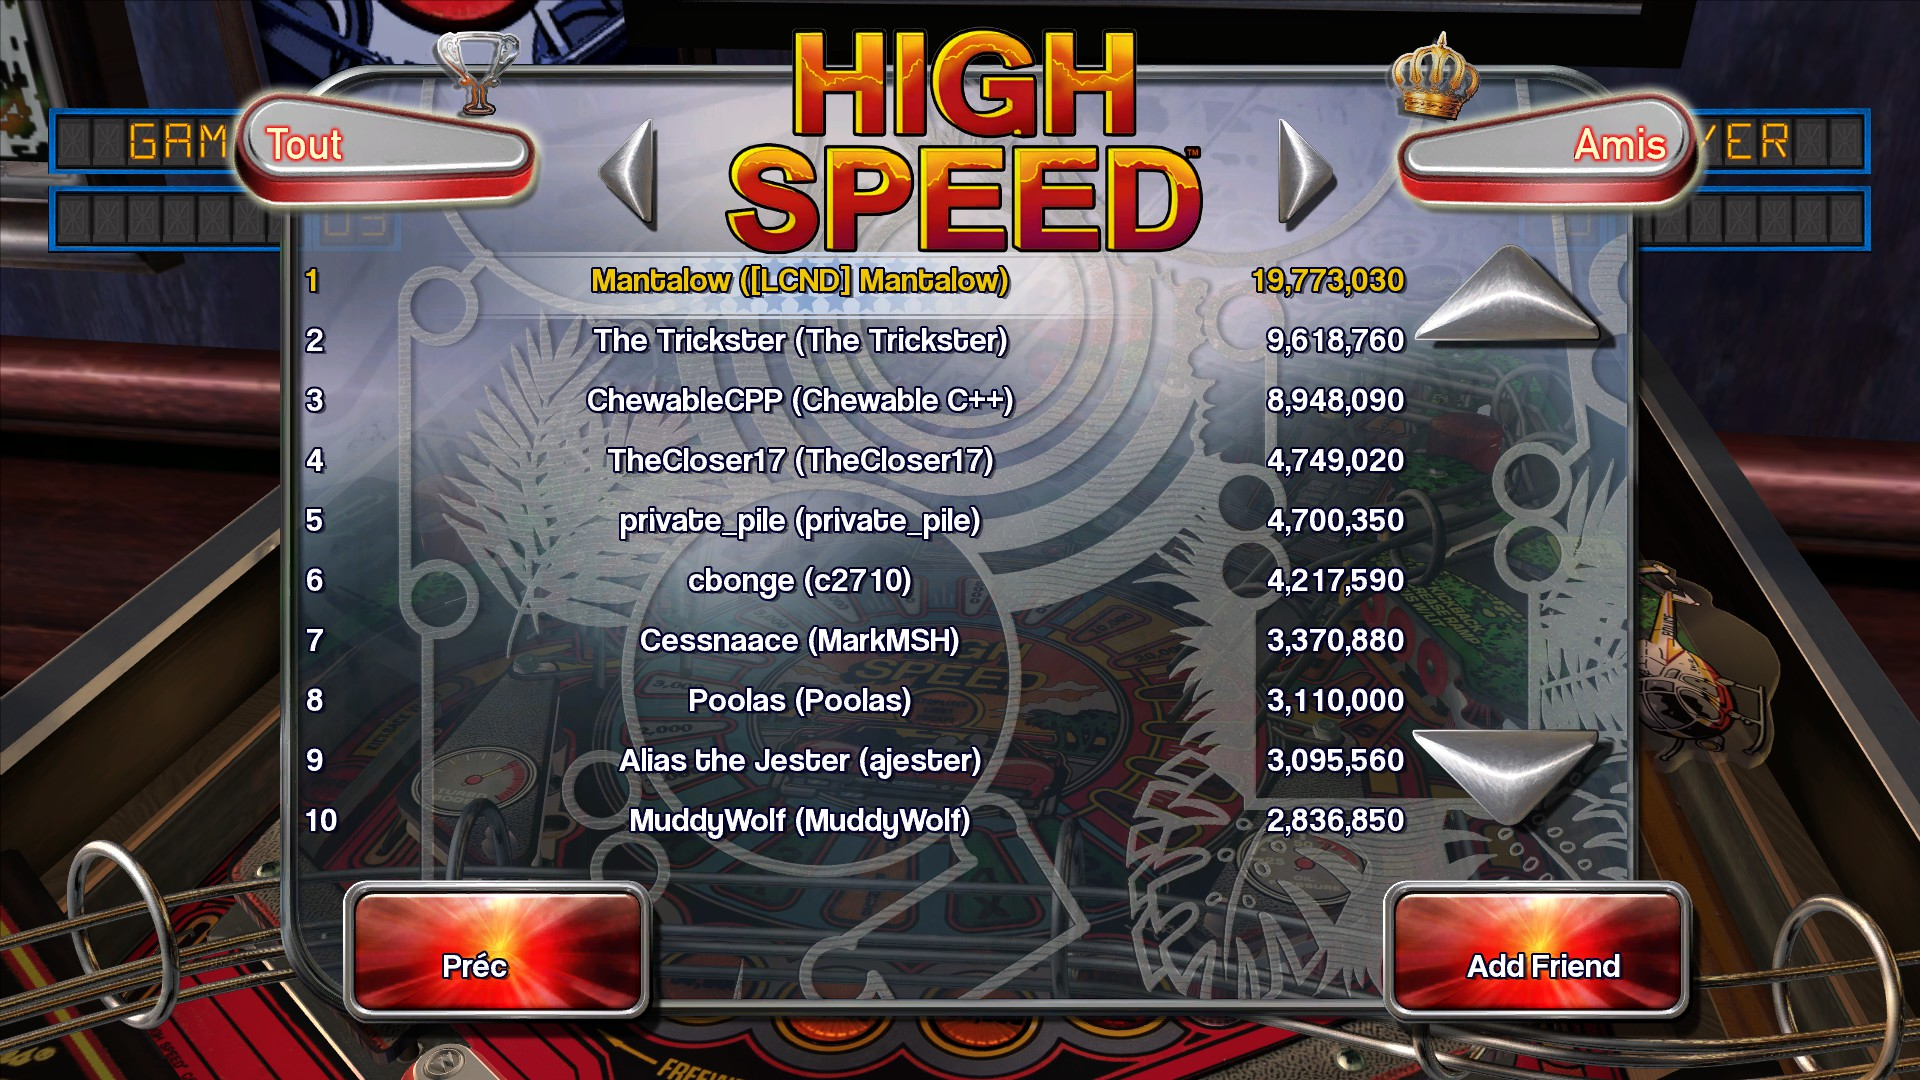 Mantalow: Pinball Arcade: High Speed (PC) 19,773,030 points on 2016-02-23 11:59:03